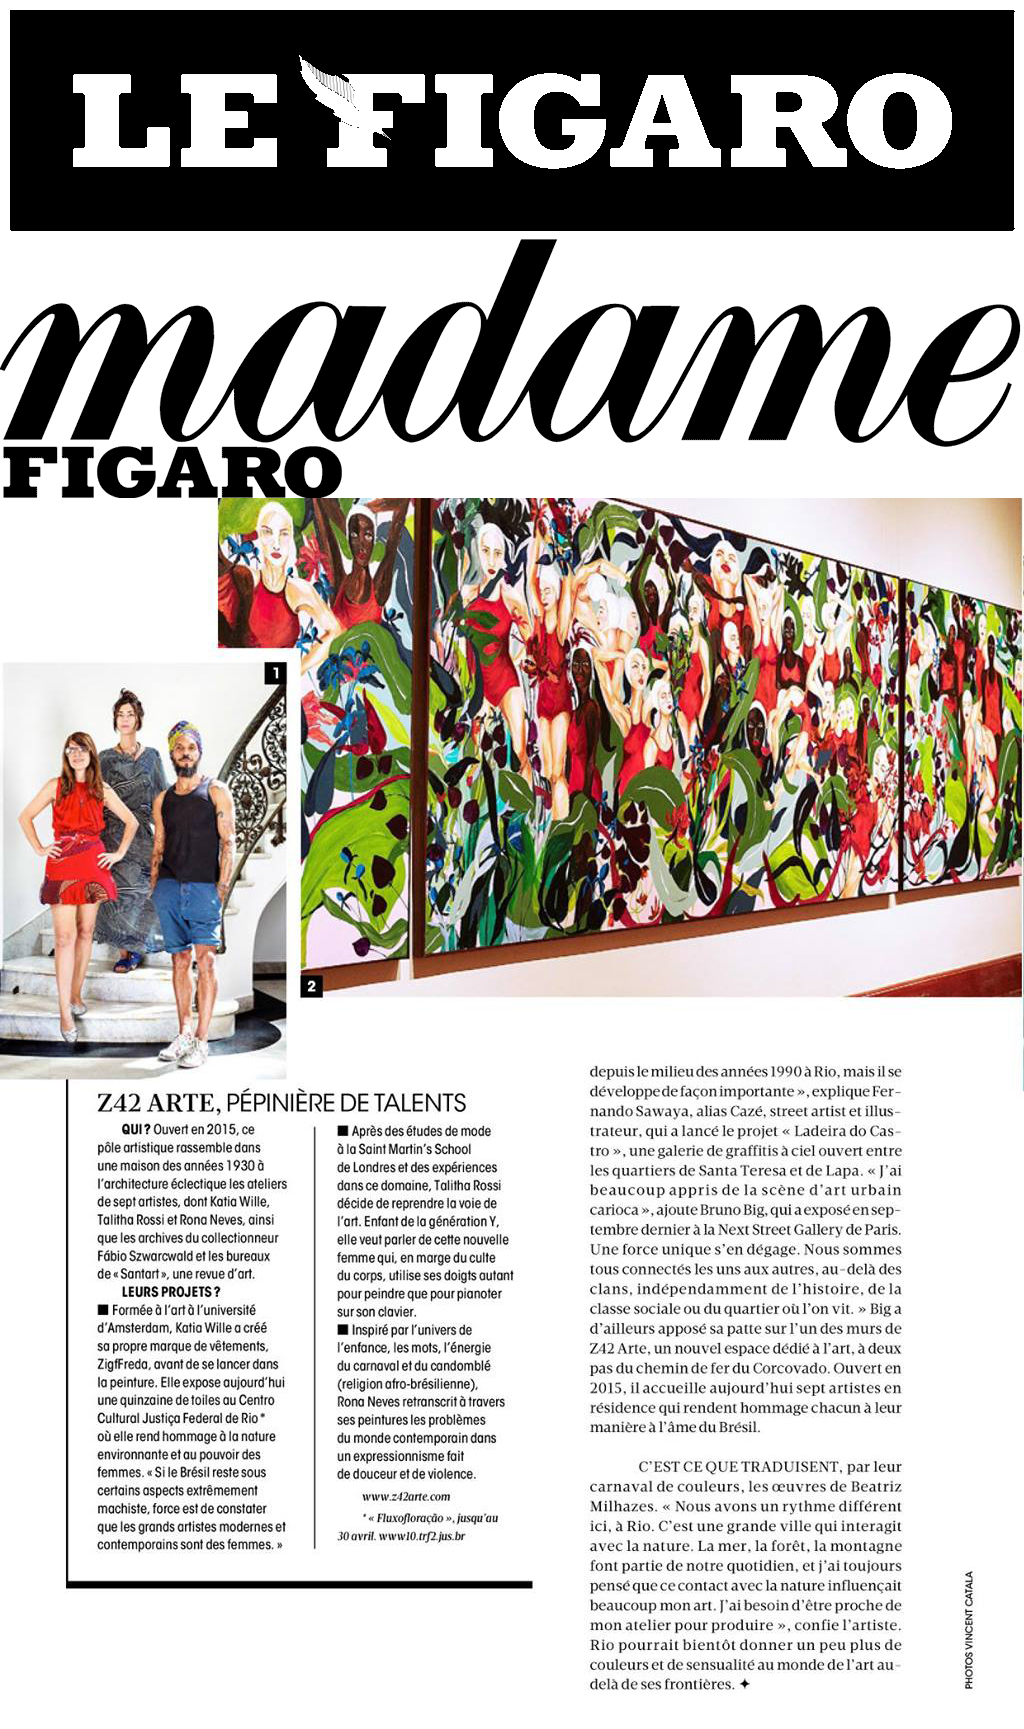 Le Figaro - France